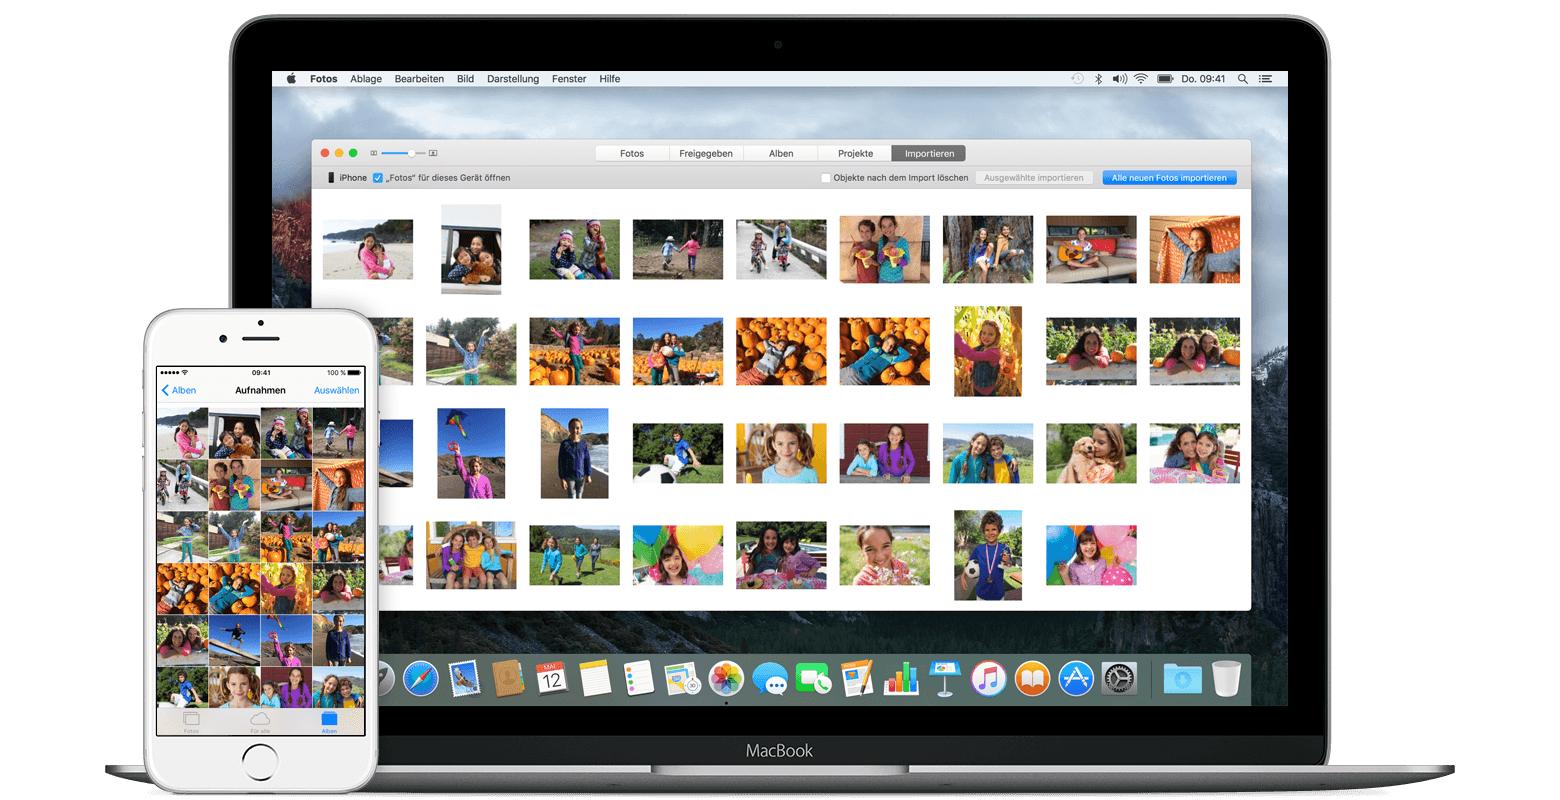 fotos und videos vom iphone ipad oder ipod touch importieren apple support. Black Bedroom Furniture Sets. Home Design Ideas